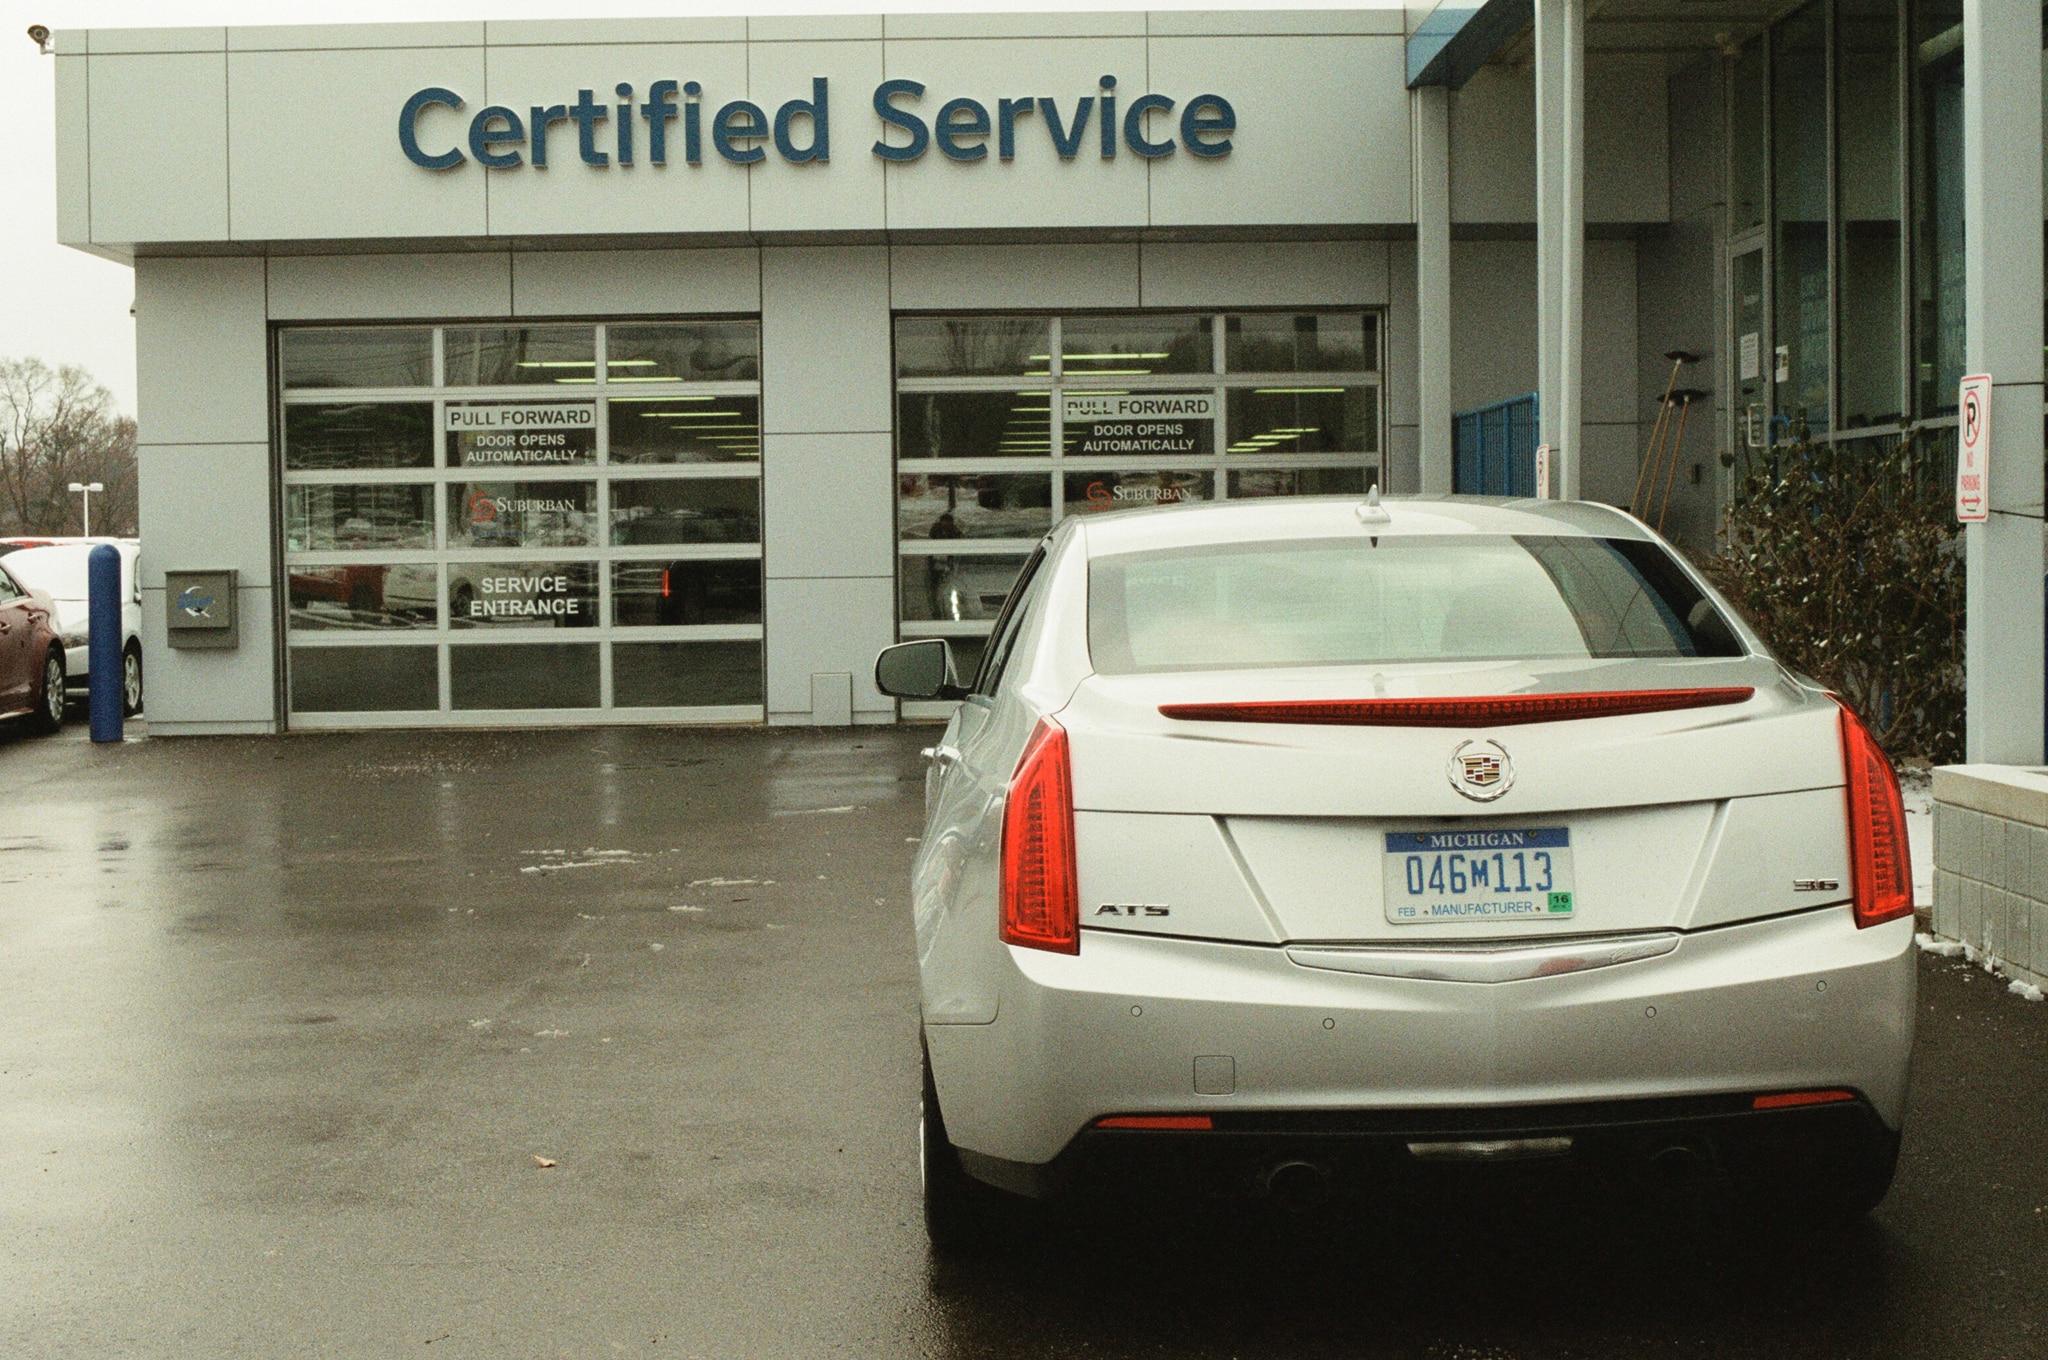 2013 Cadillac Ats Ann Arbor Dealer Service1